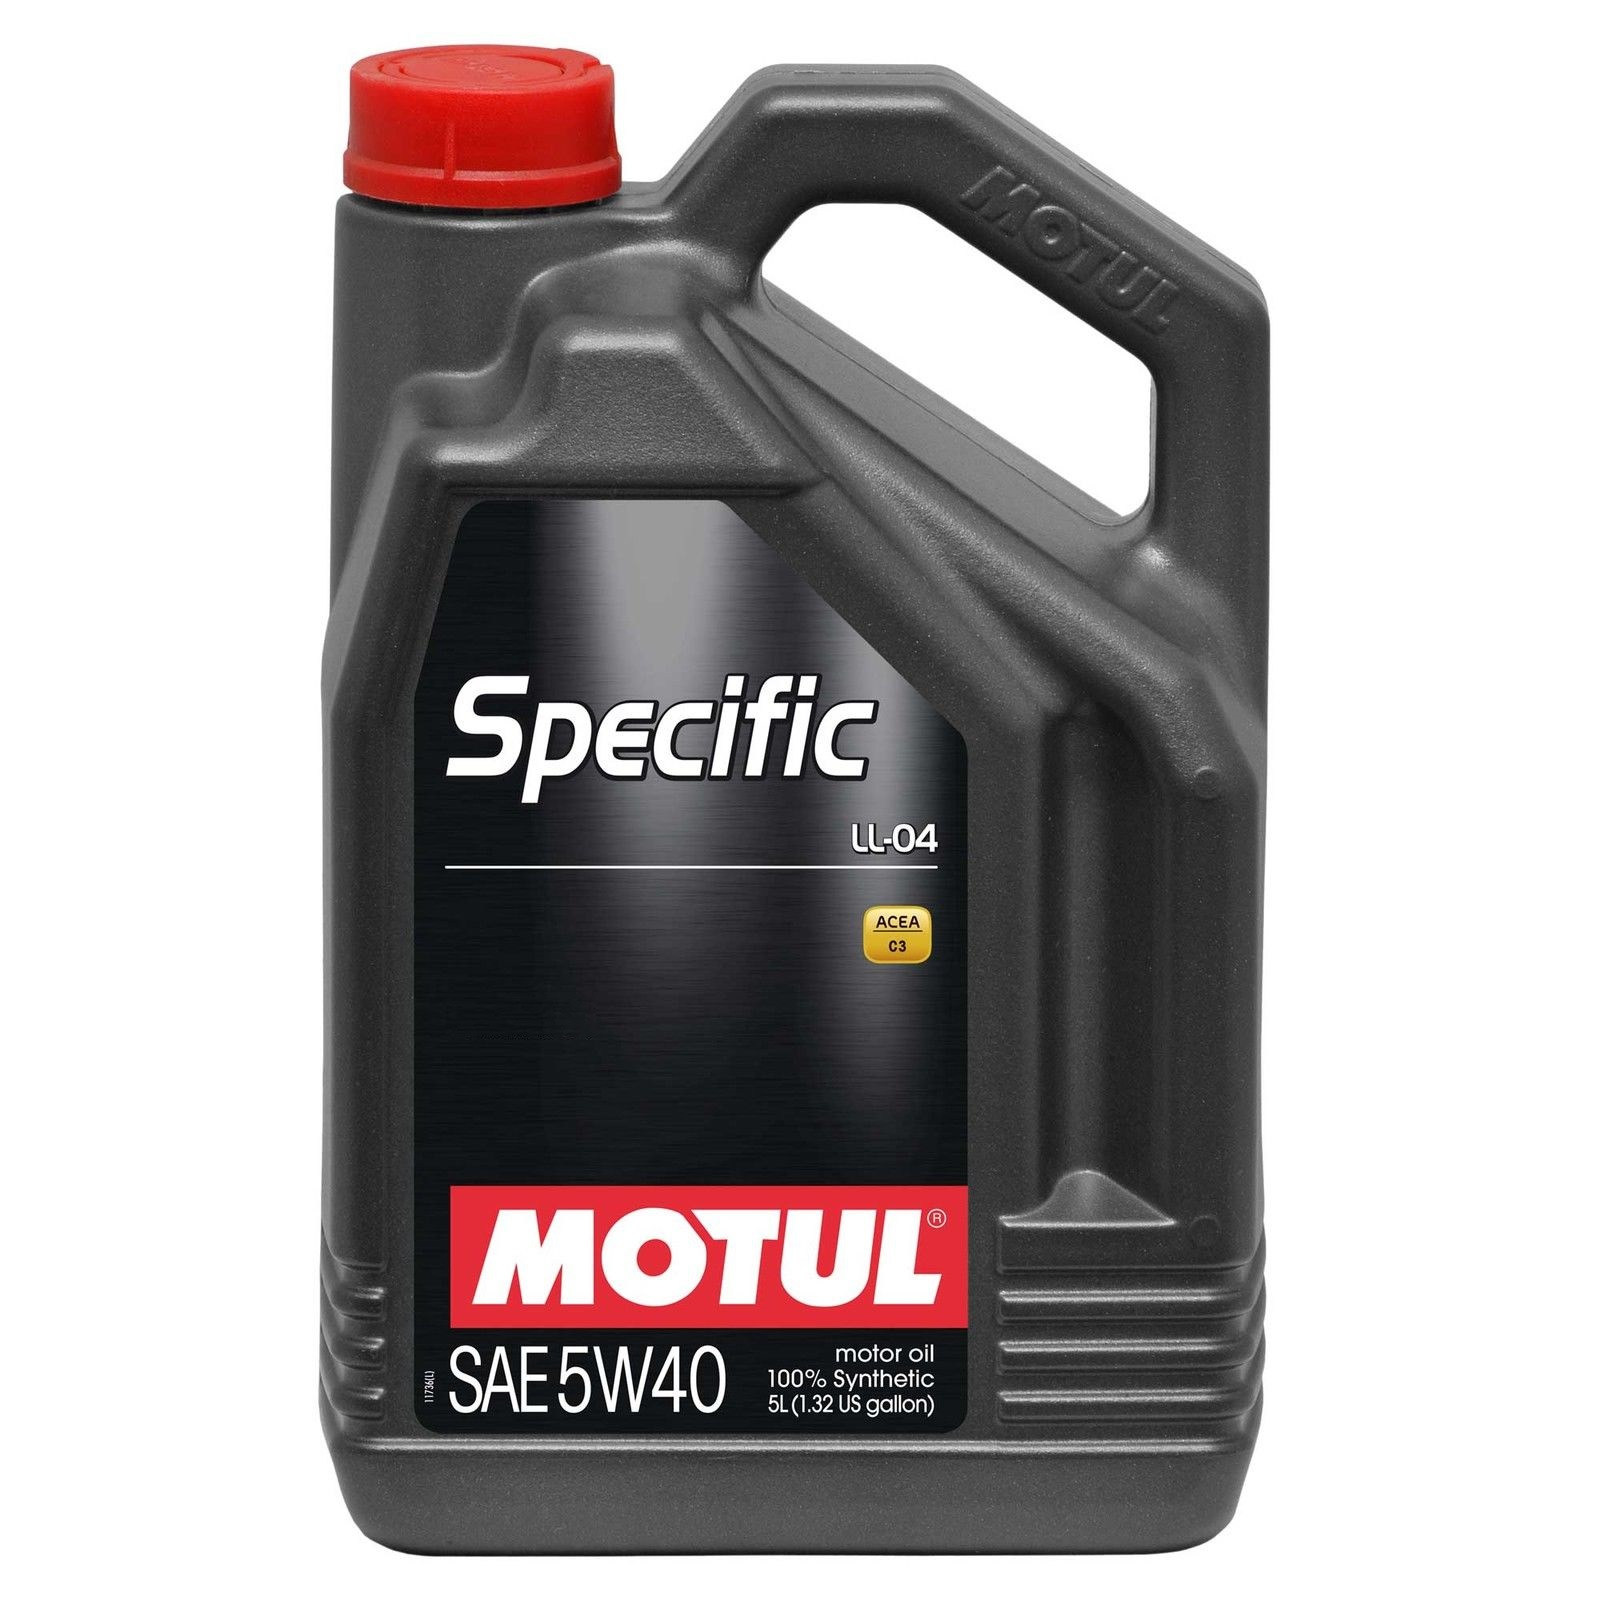 Moottoriöljy MOTUL SPECIFIC 5W40 5L